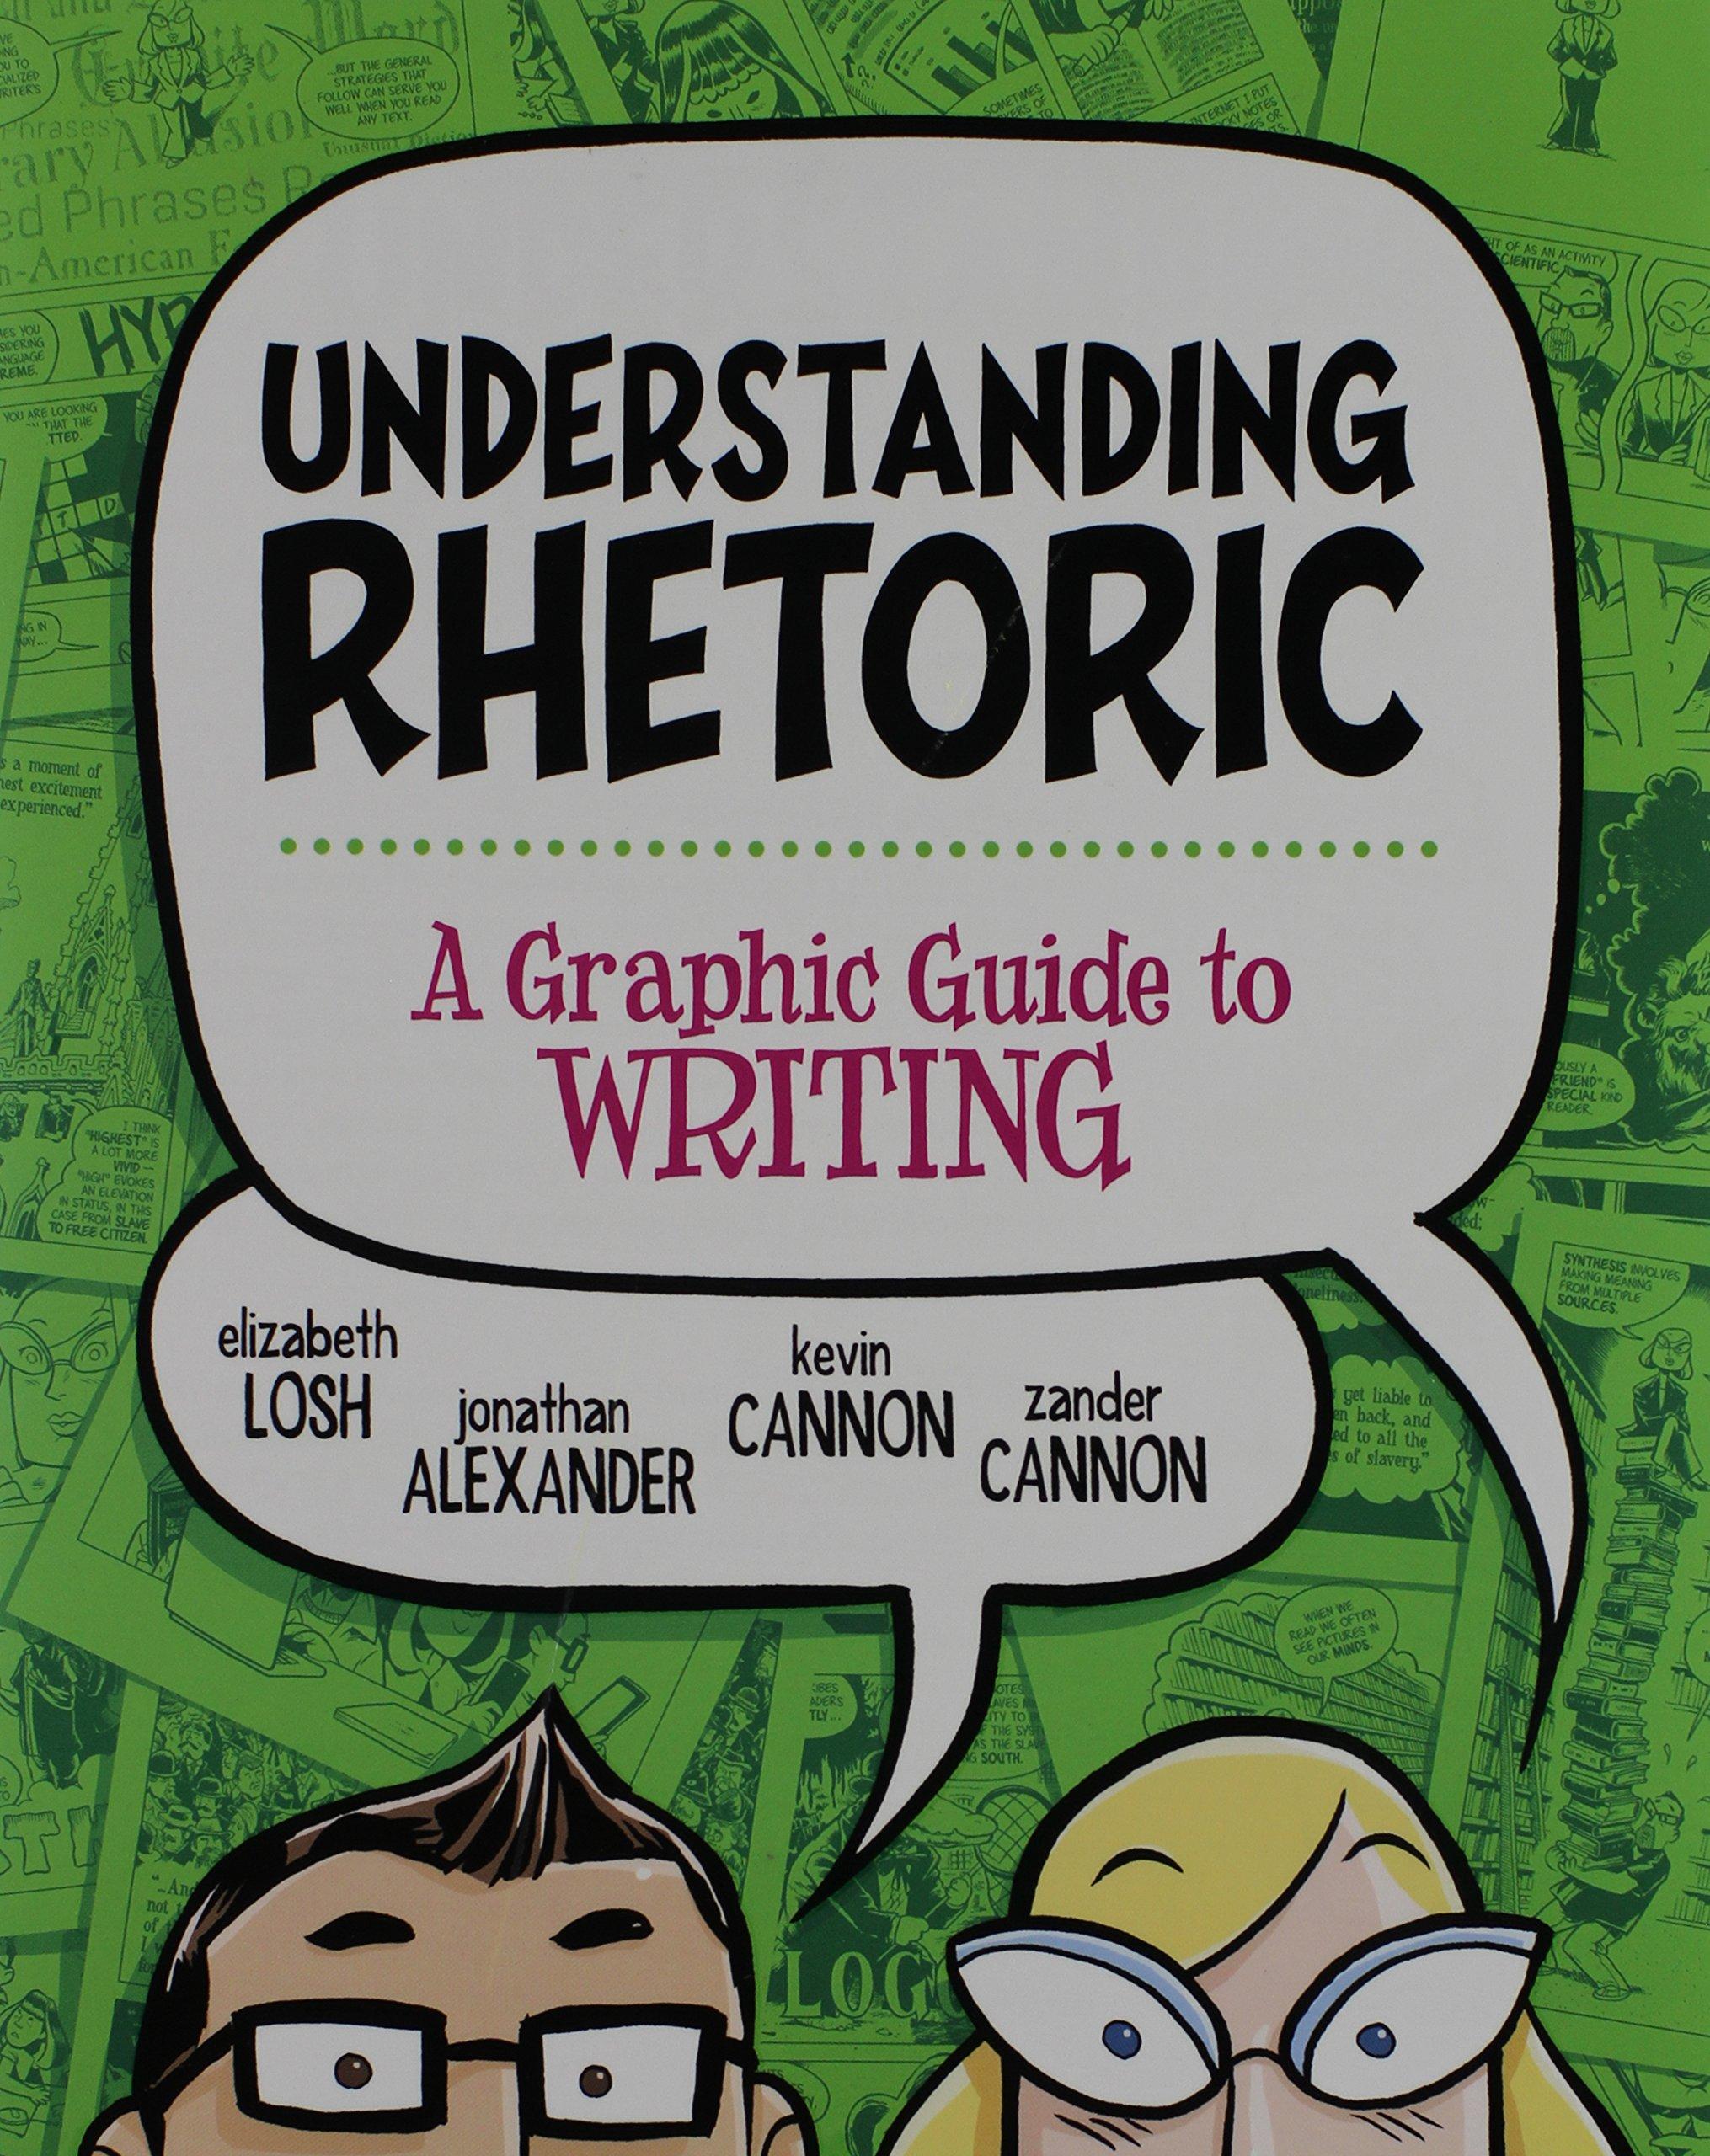 Understanding Rhetoric: A Graphic Guide to Writing: Elizabeth Losh,  Jonathan Alexander, Kevin Cannon: 9780312640965: Books - Amazon.ca